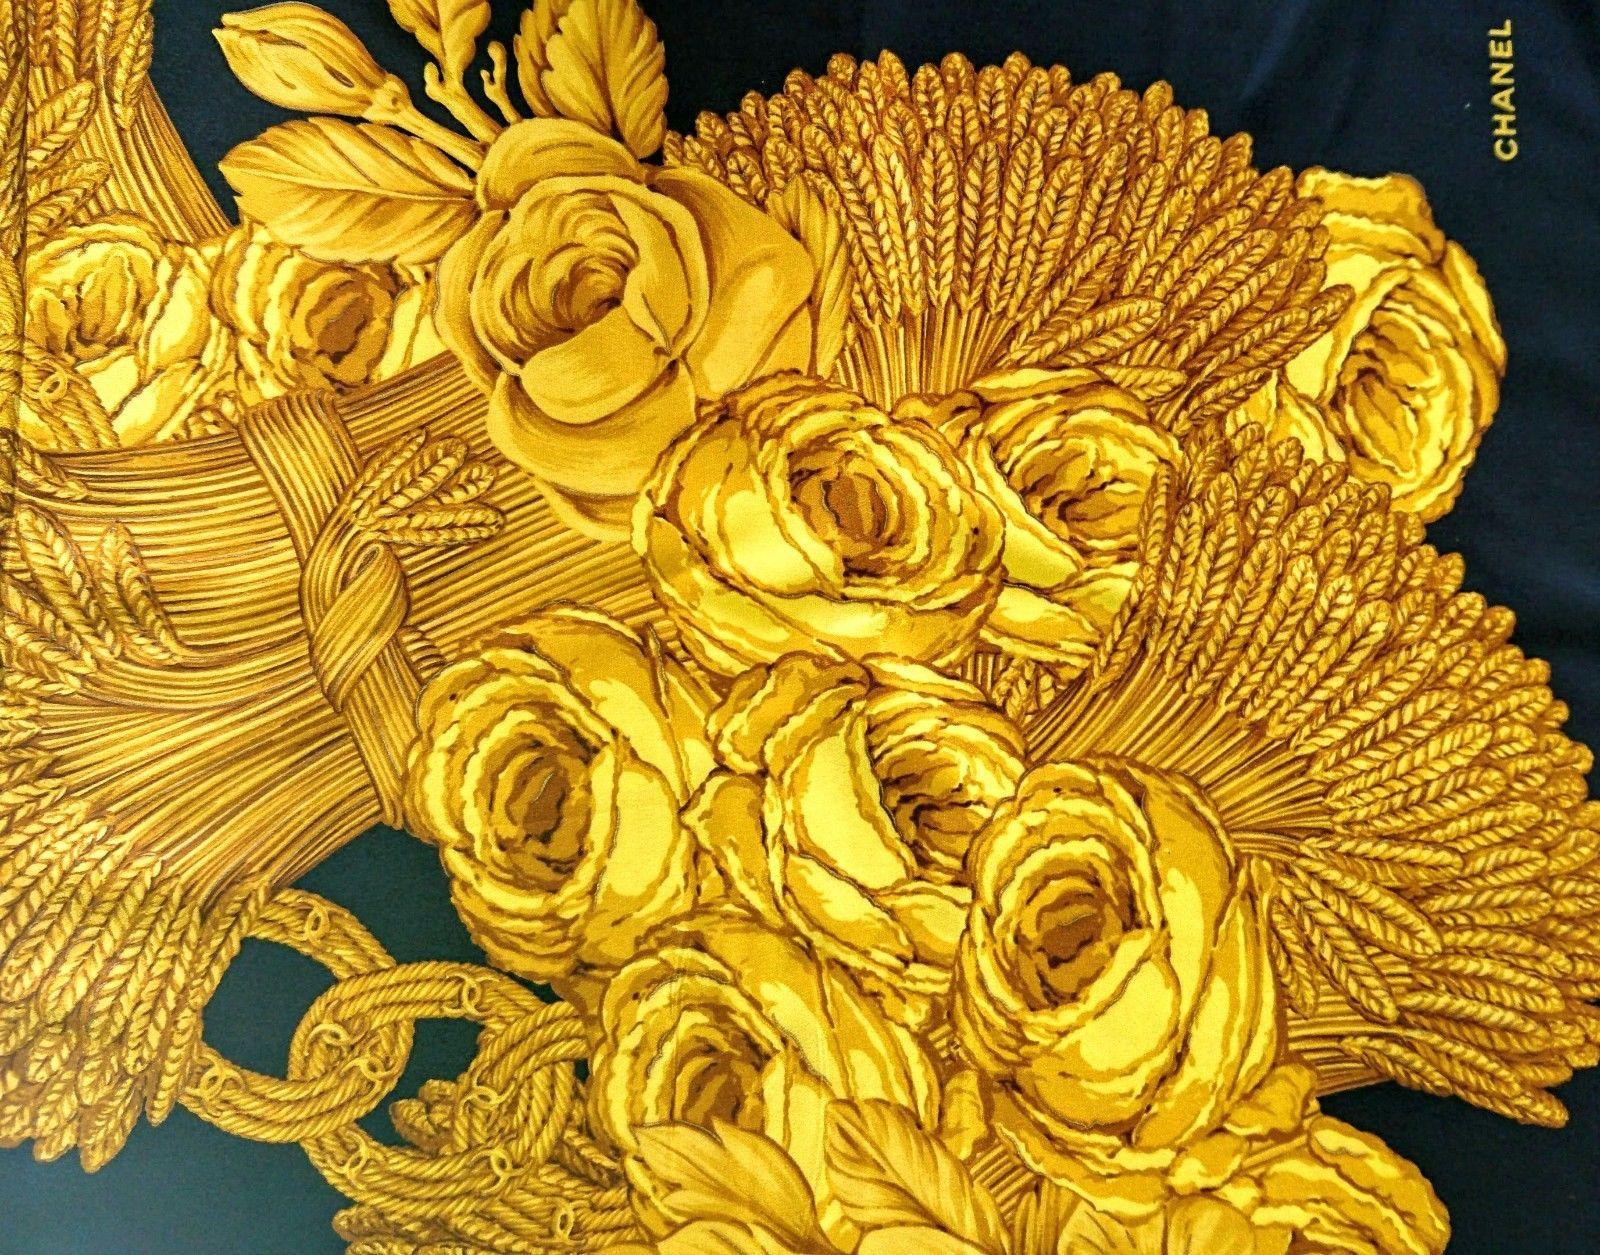 342ca93b1646 CHANEL scarf gold jewelry FRANCE 100% SILK ITALY foulard black camelia  vintage   eBay